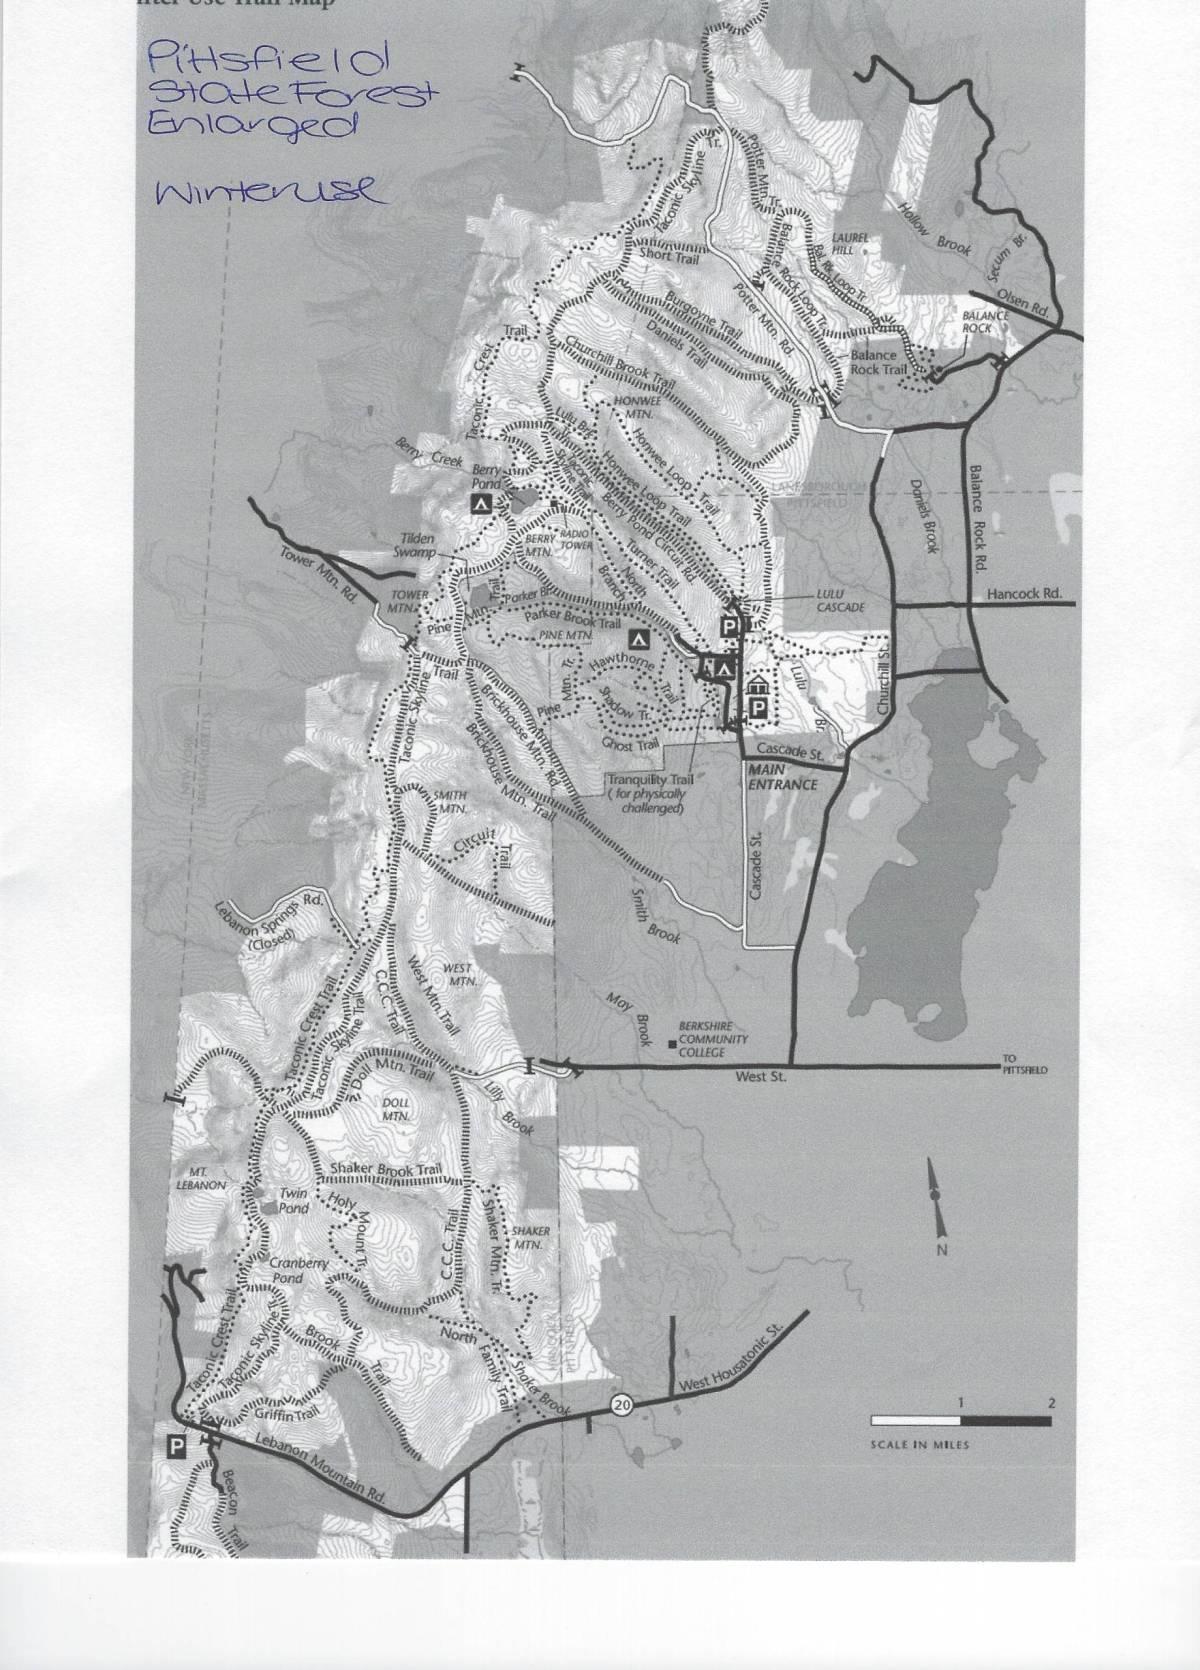 Pittsfield SF Winter Enlarged jpg